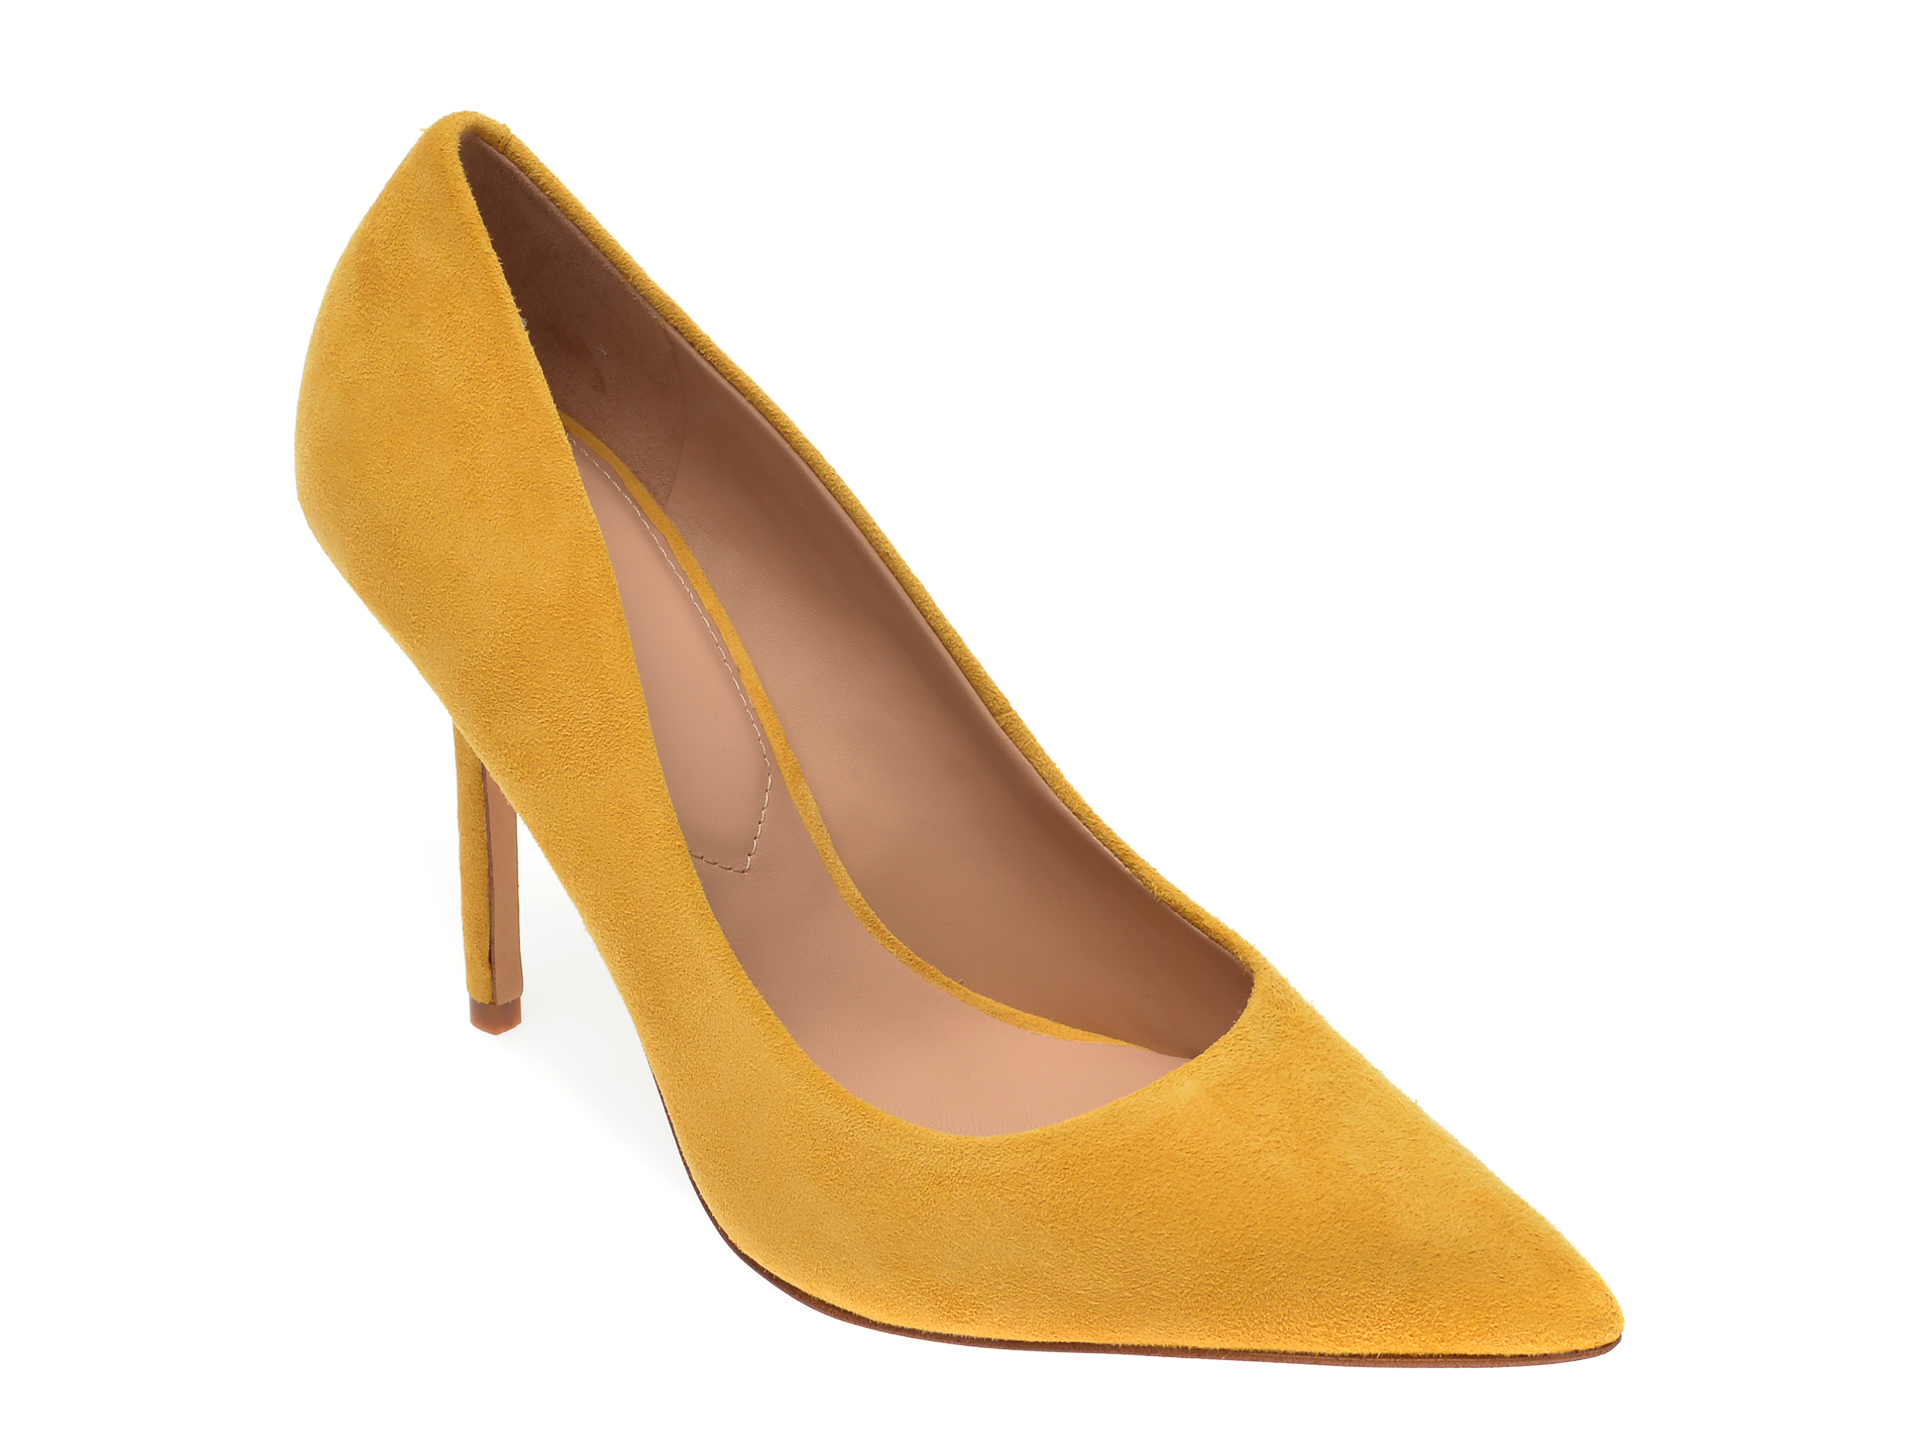 Pantofi ALDO galbeni, Sophy730, din piele intoarsa